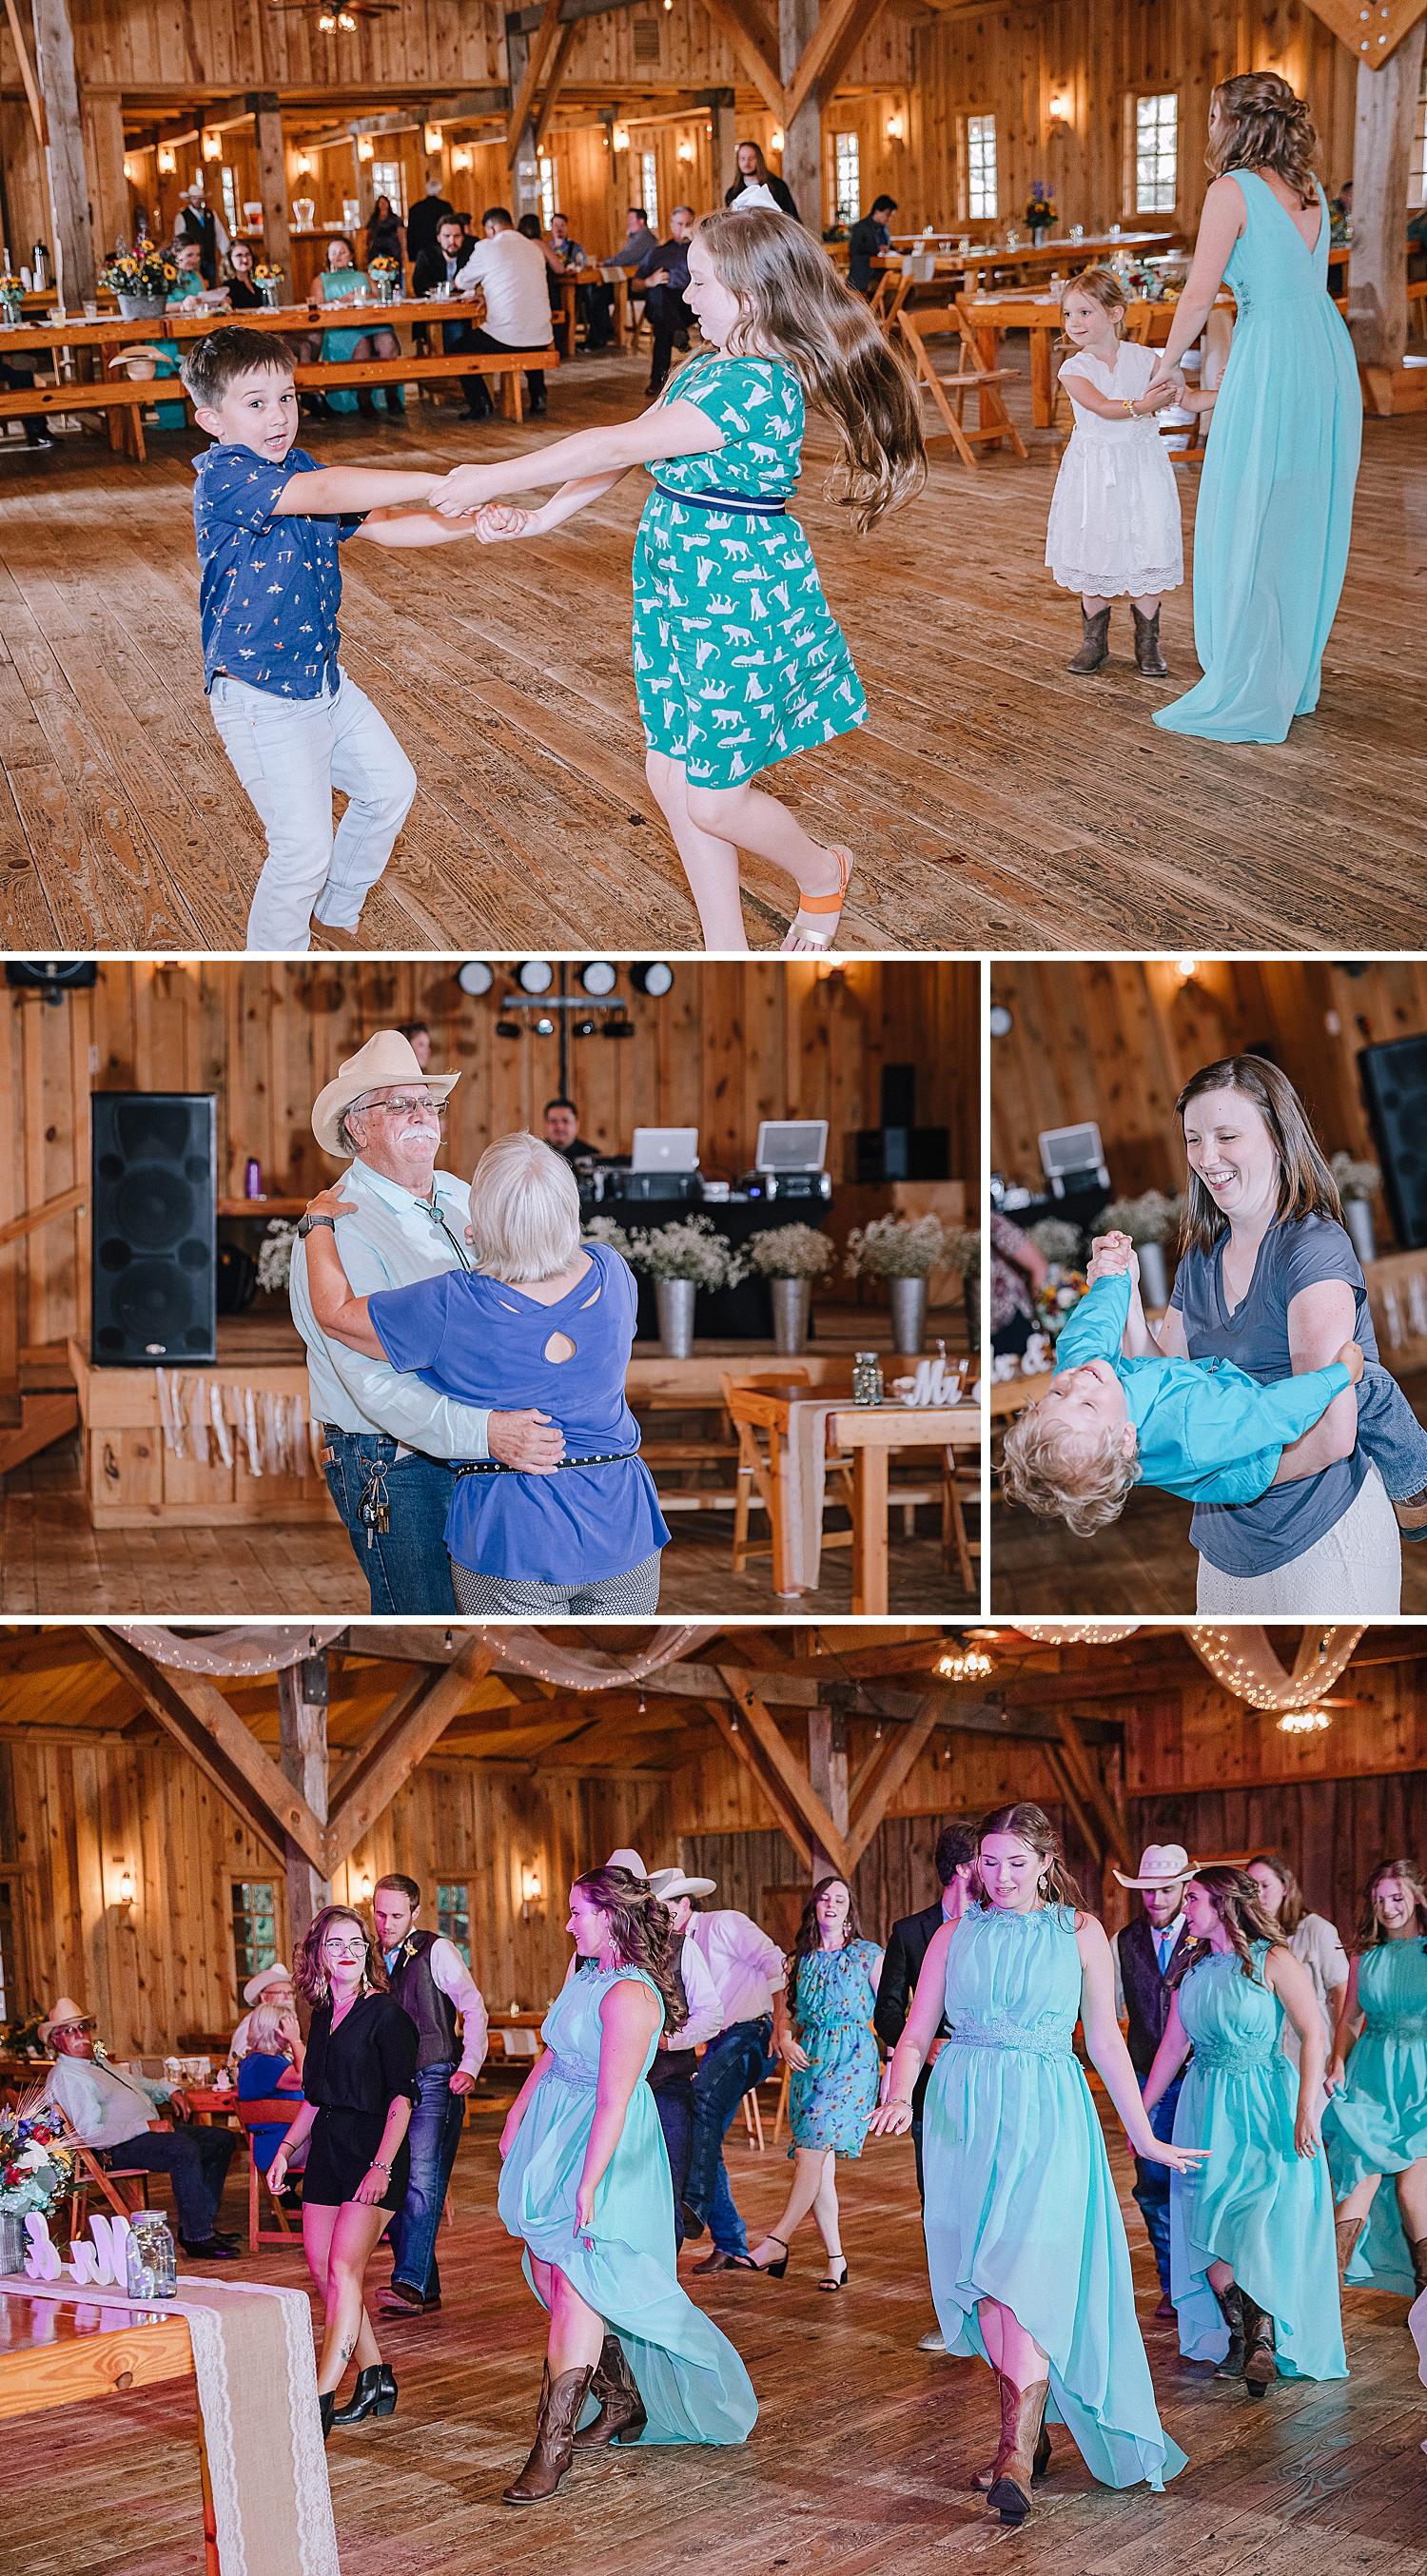 Carly-Barton-Photography-Old-Town-Texas-Rustic-Wedding-Photos-Sunflowers-Boots-Kyle-Texas_0106.jpg